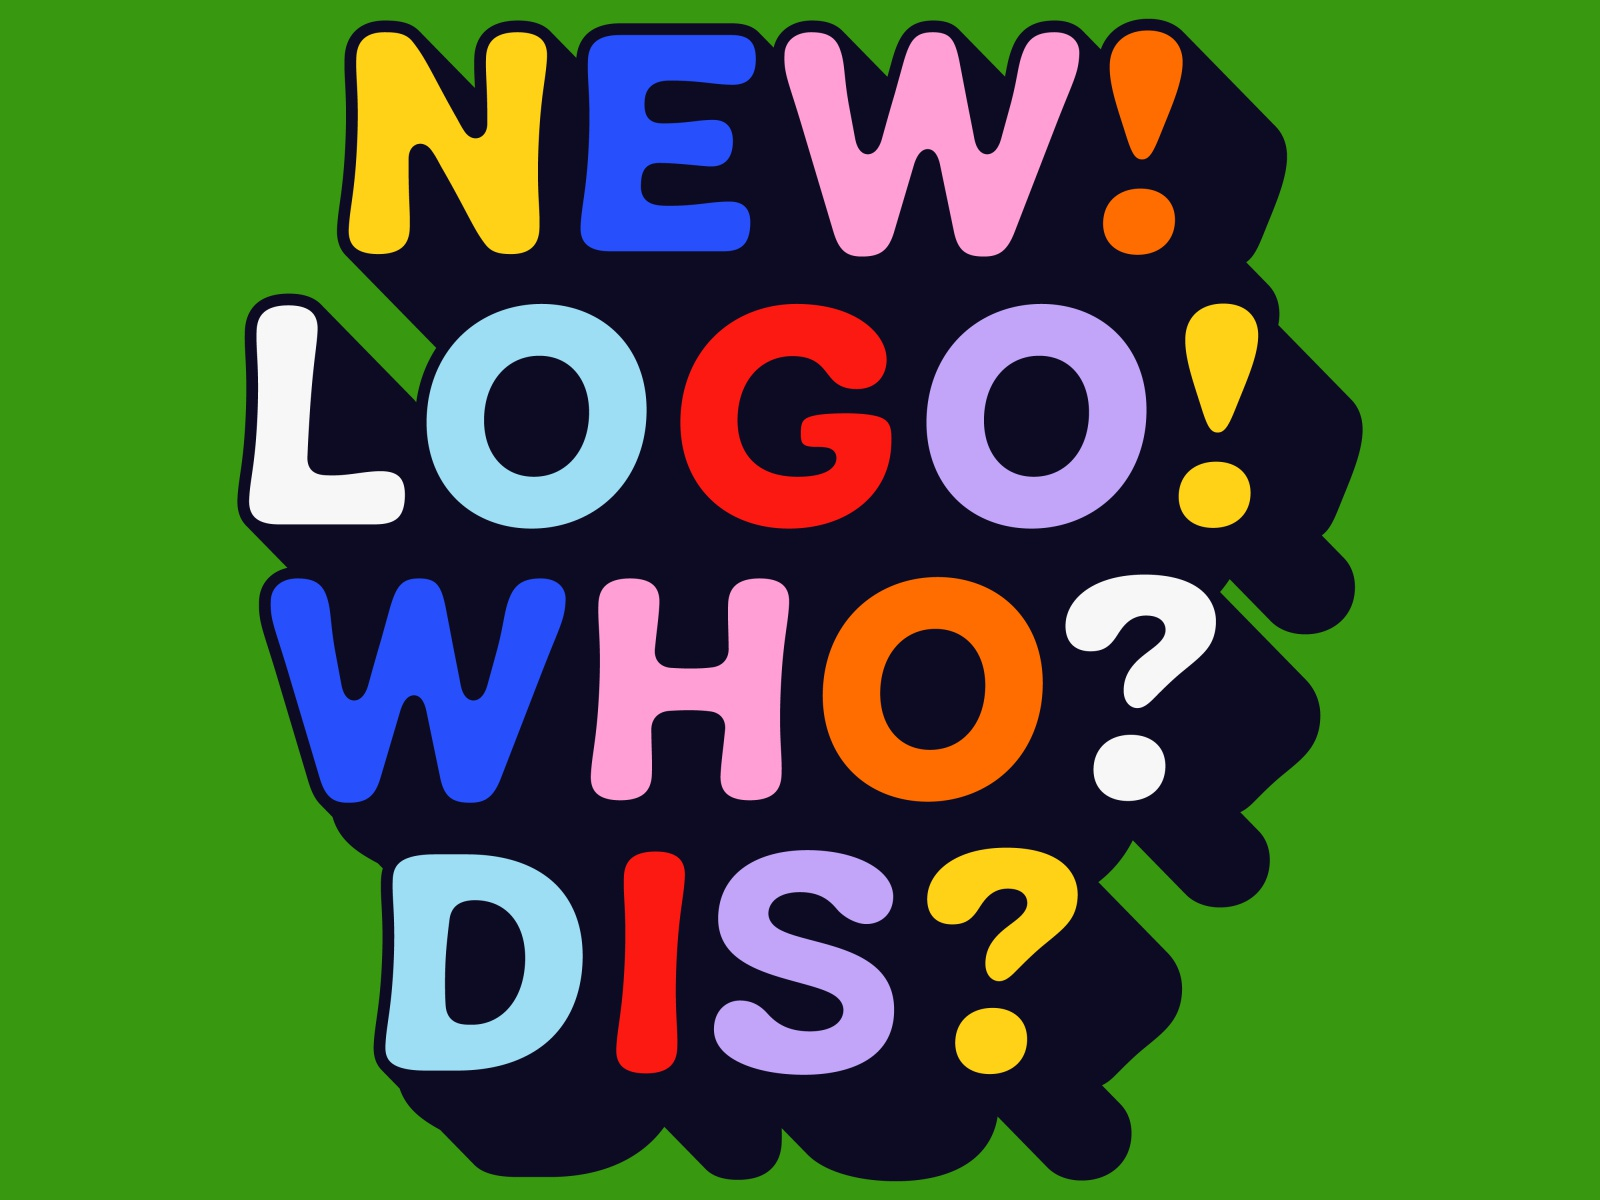 Overtime: New Logo, Who Dis?